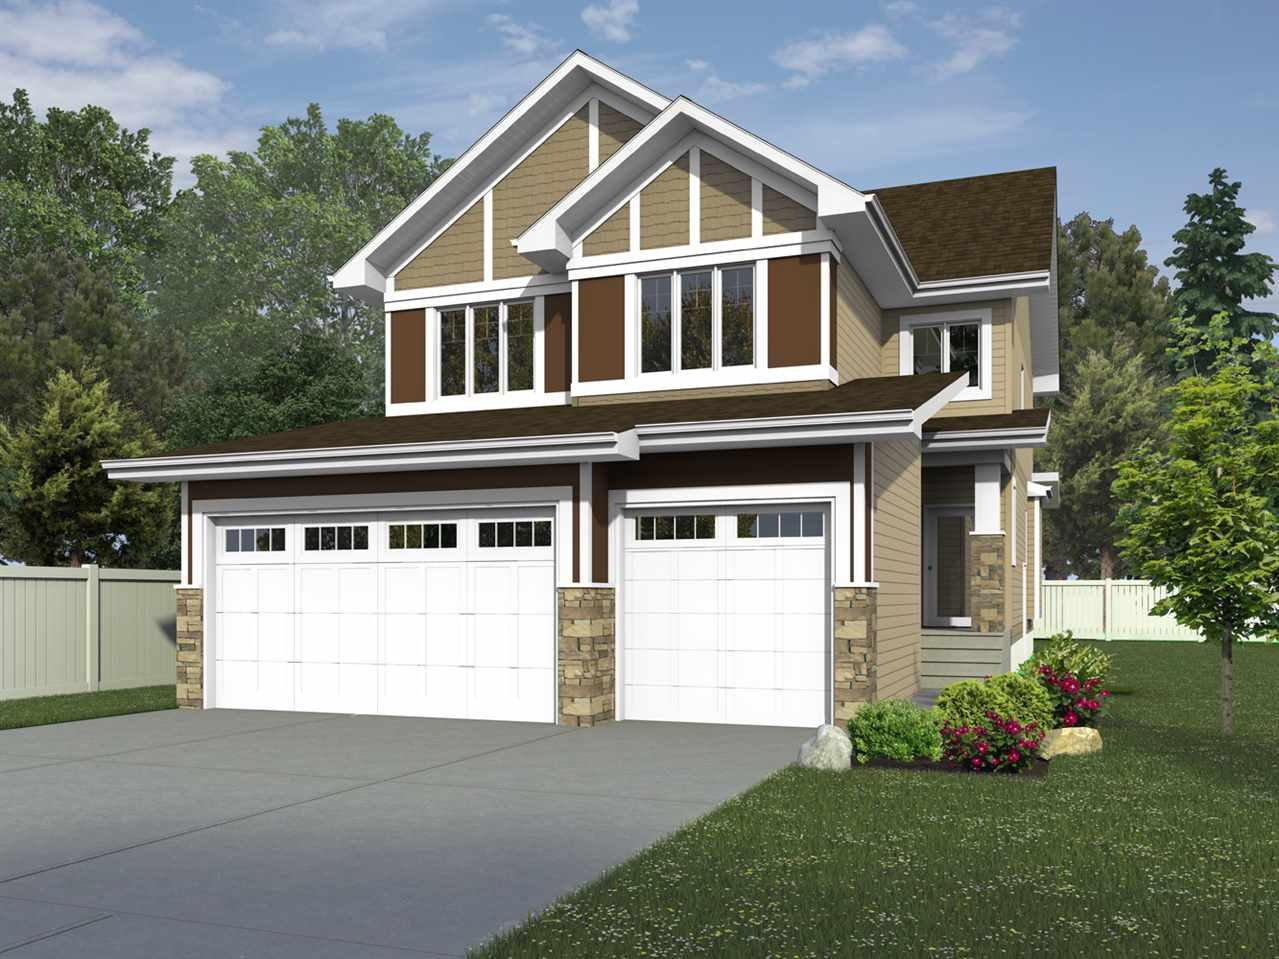 Main Photo: 5813 PELERIN Crescent: Beaumont House for sale : MLS®# E4205067